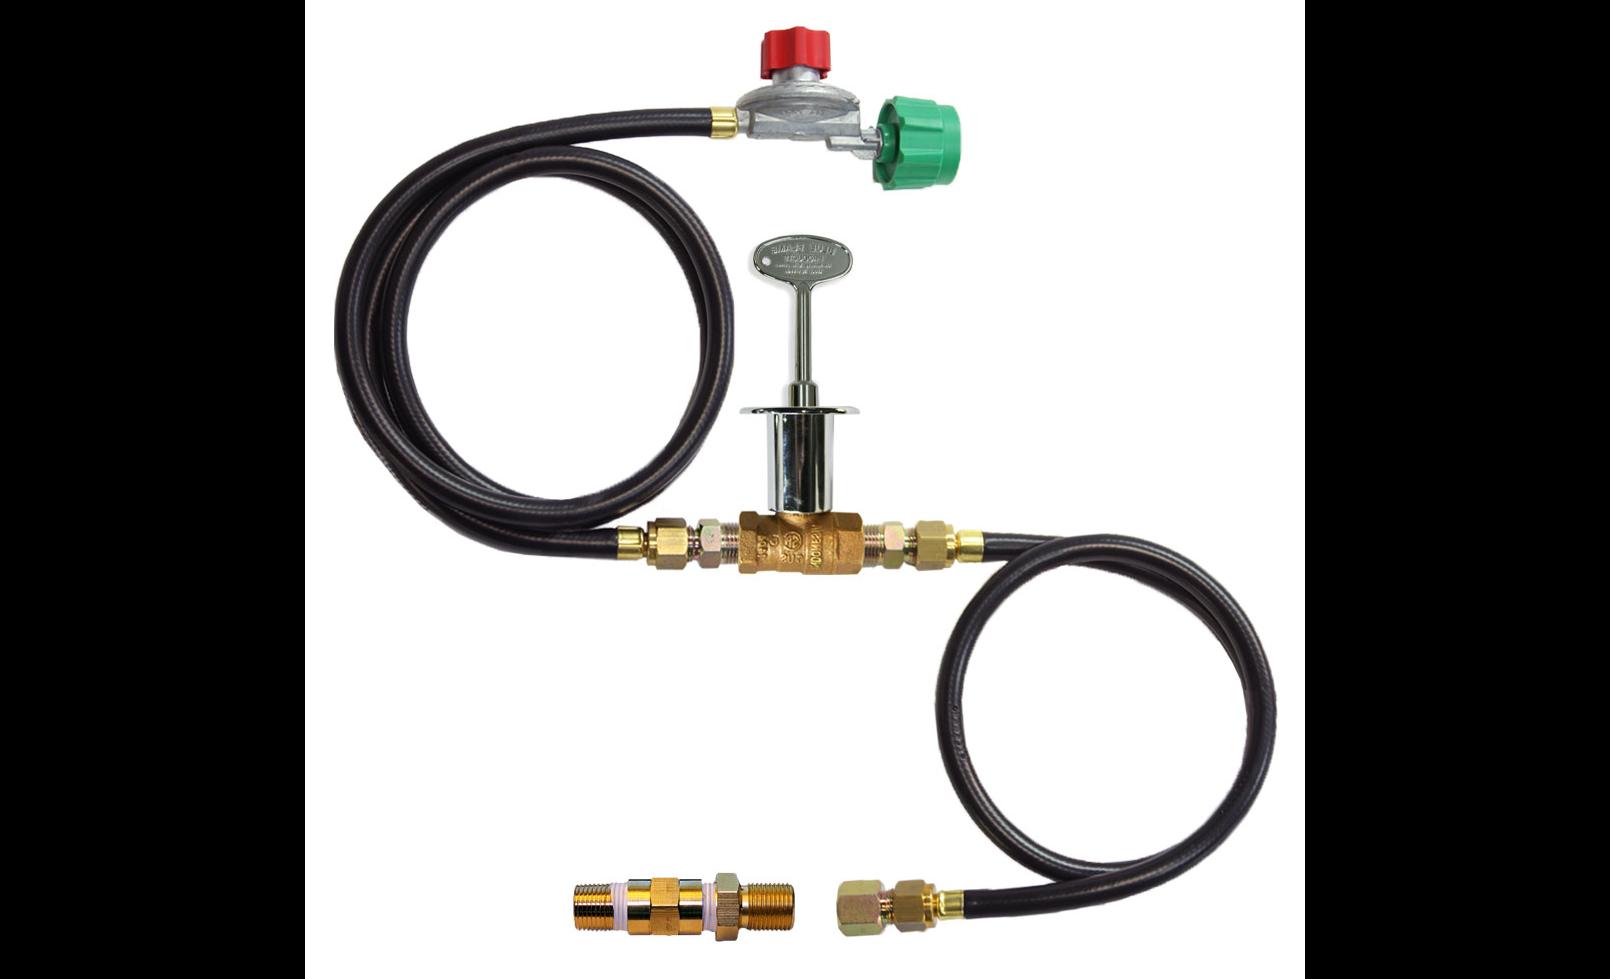 A gas connection kit setup